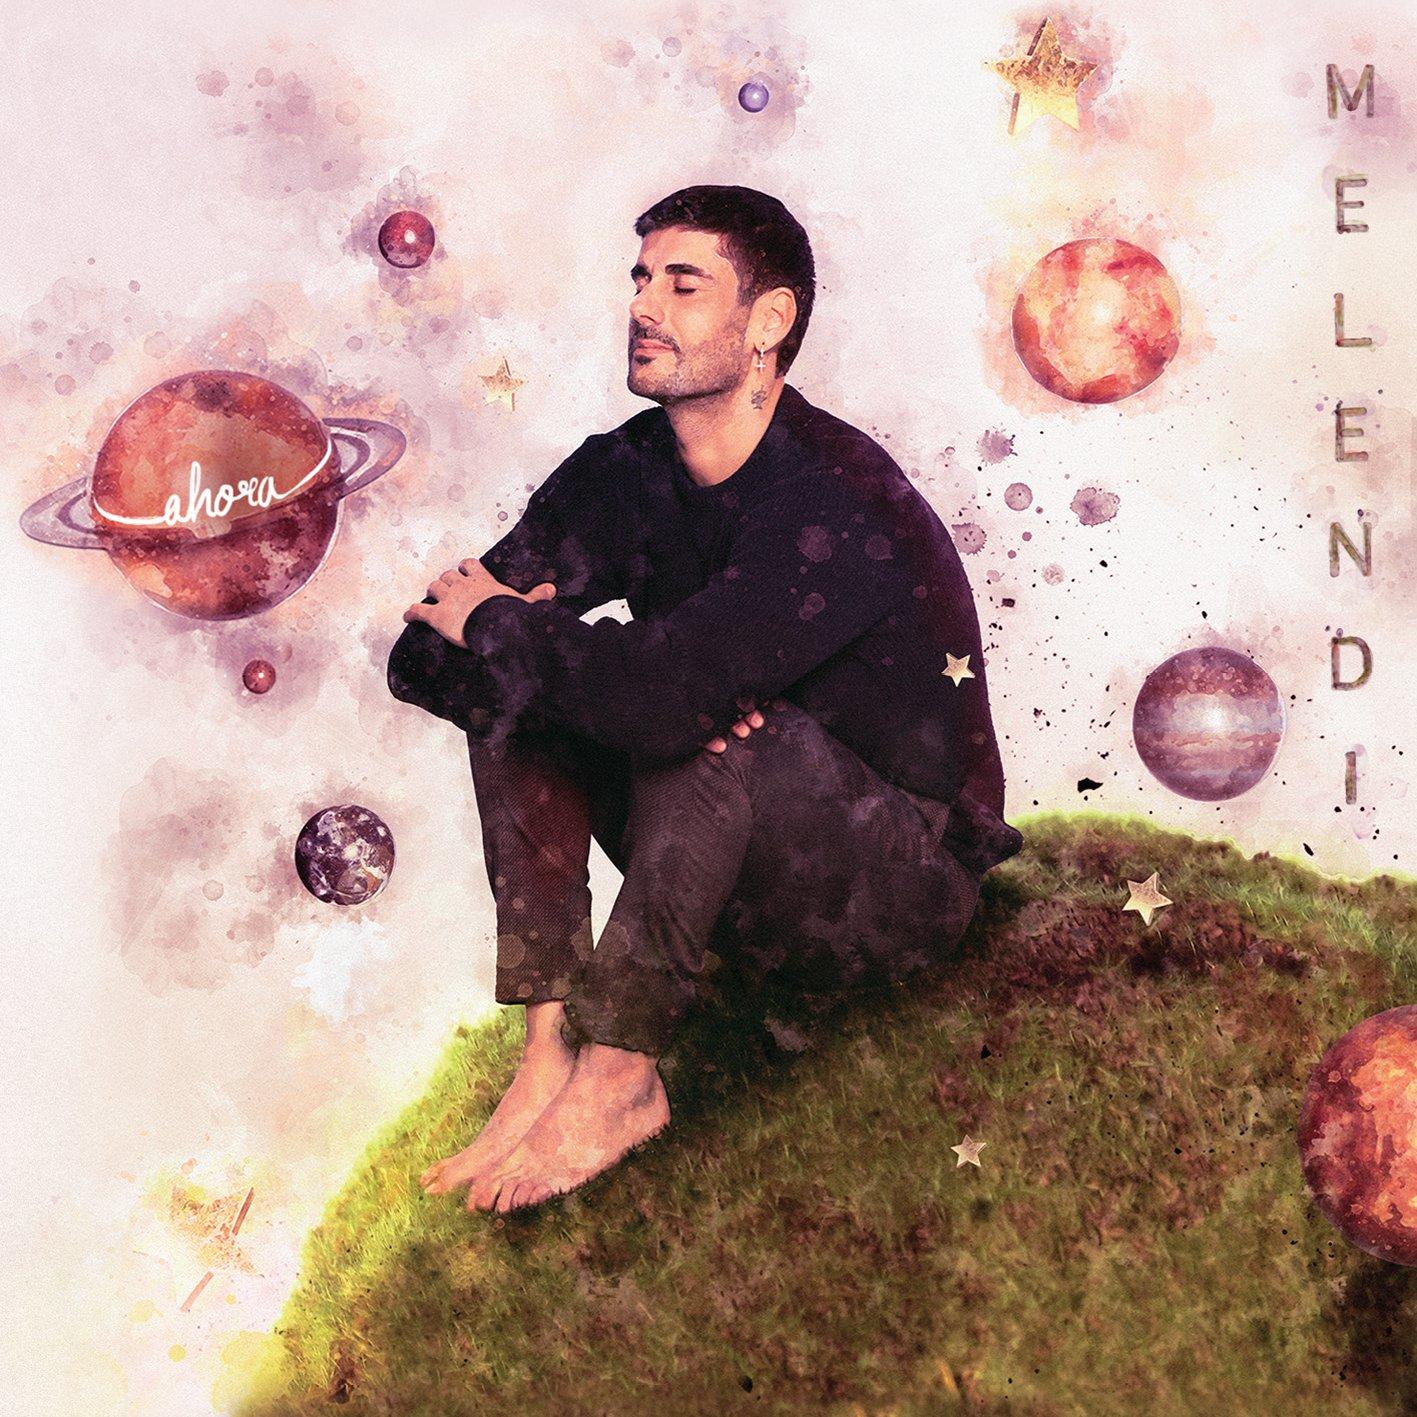 CD : Melendi - Ahora (CD)